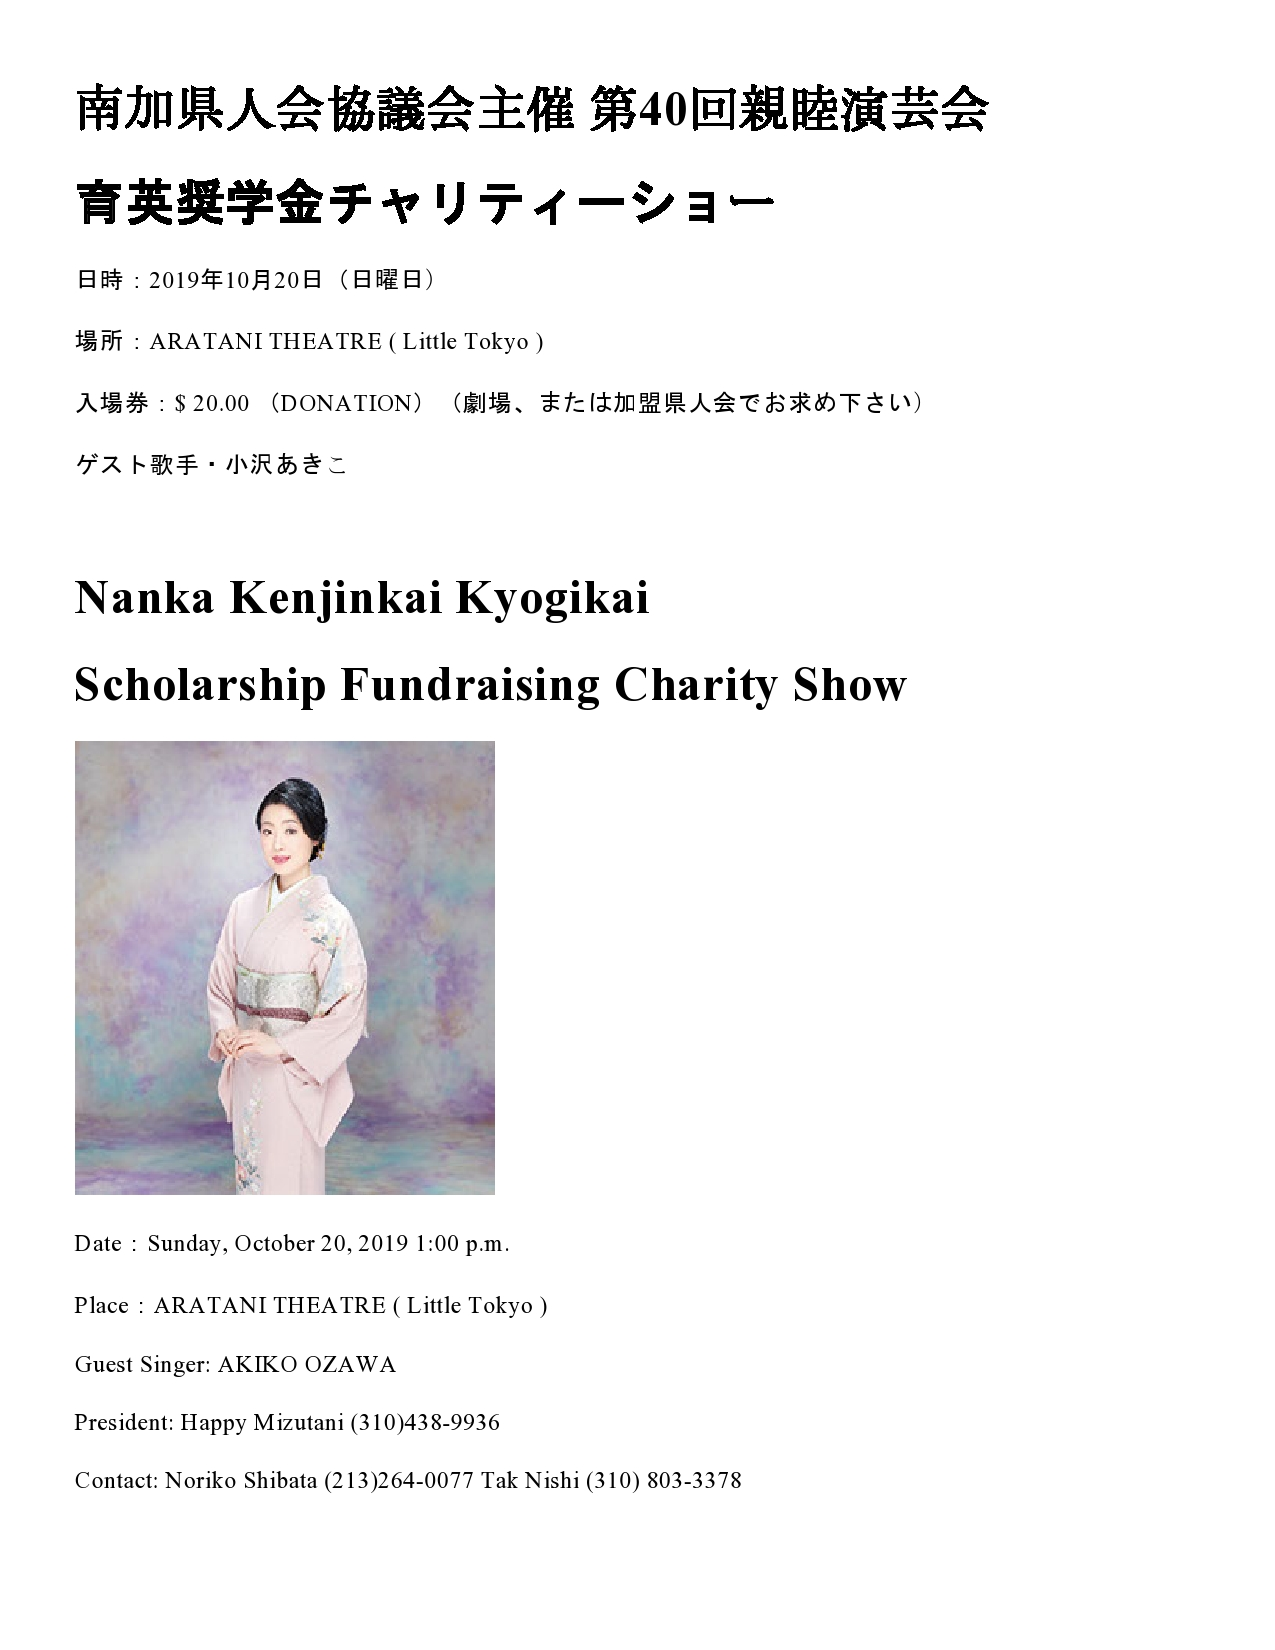 Nanka Kenjinkai-10.20.19-page0001.jpg